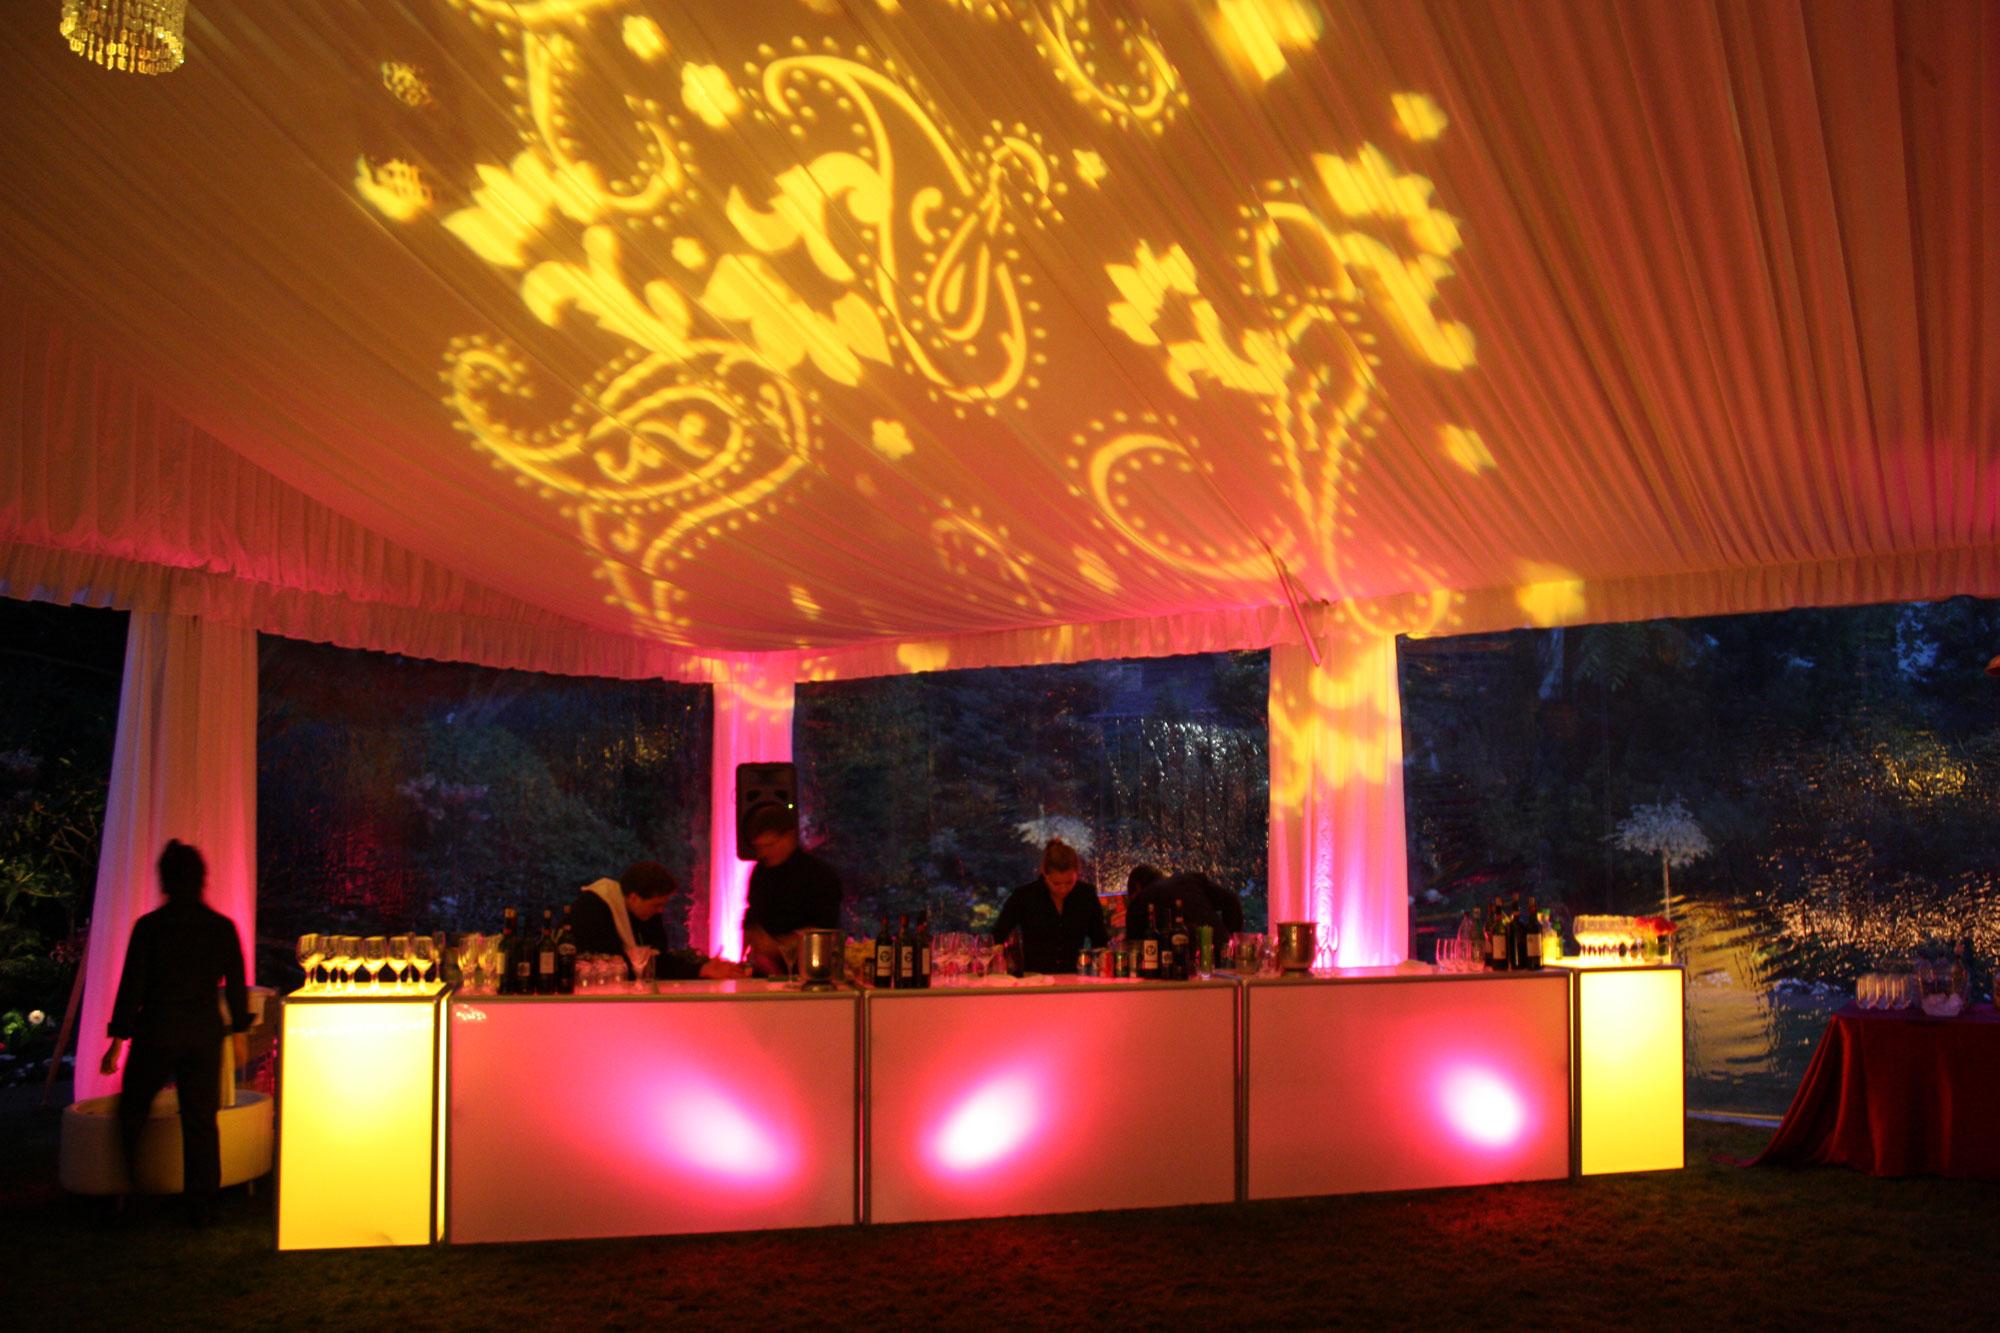 Custom LED Bar with Pattern Lighting - glow bar - gobo - paisley lighting